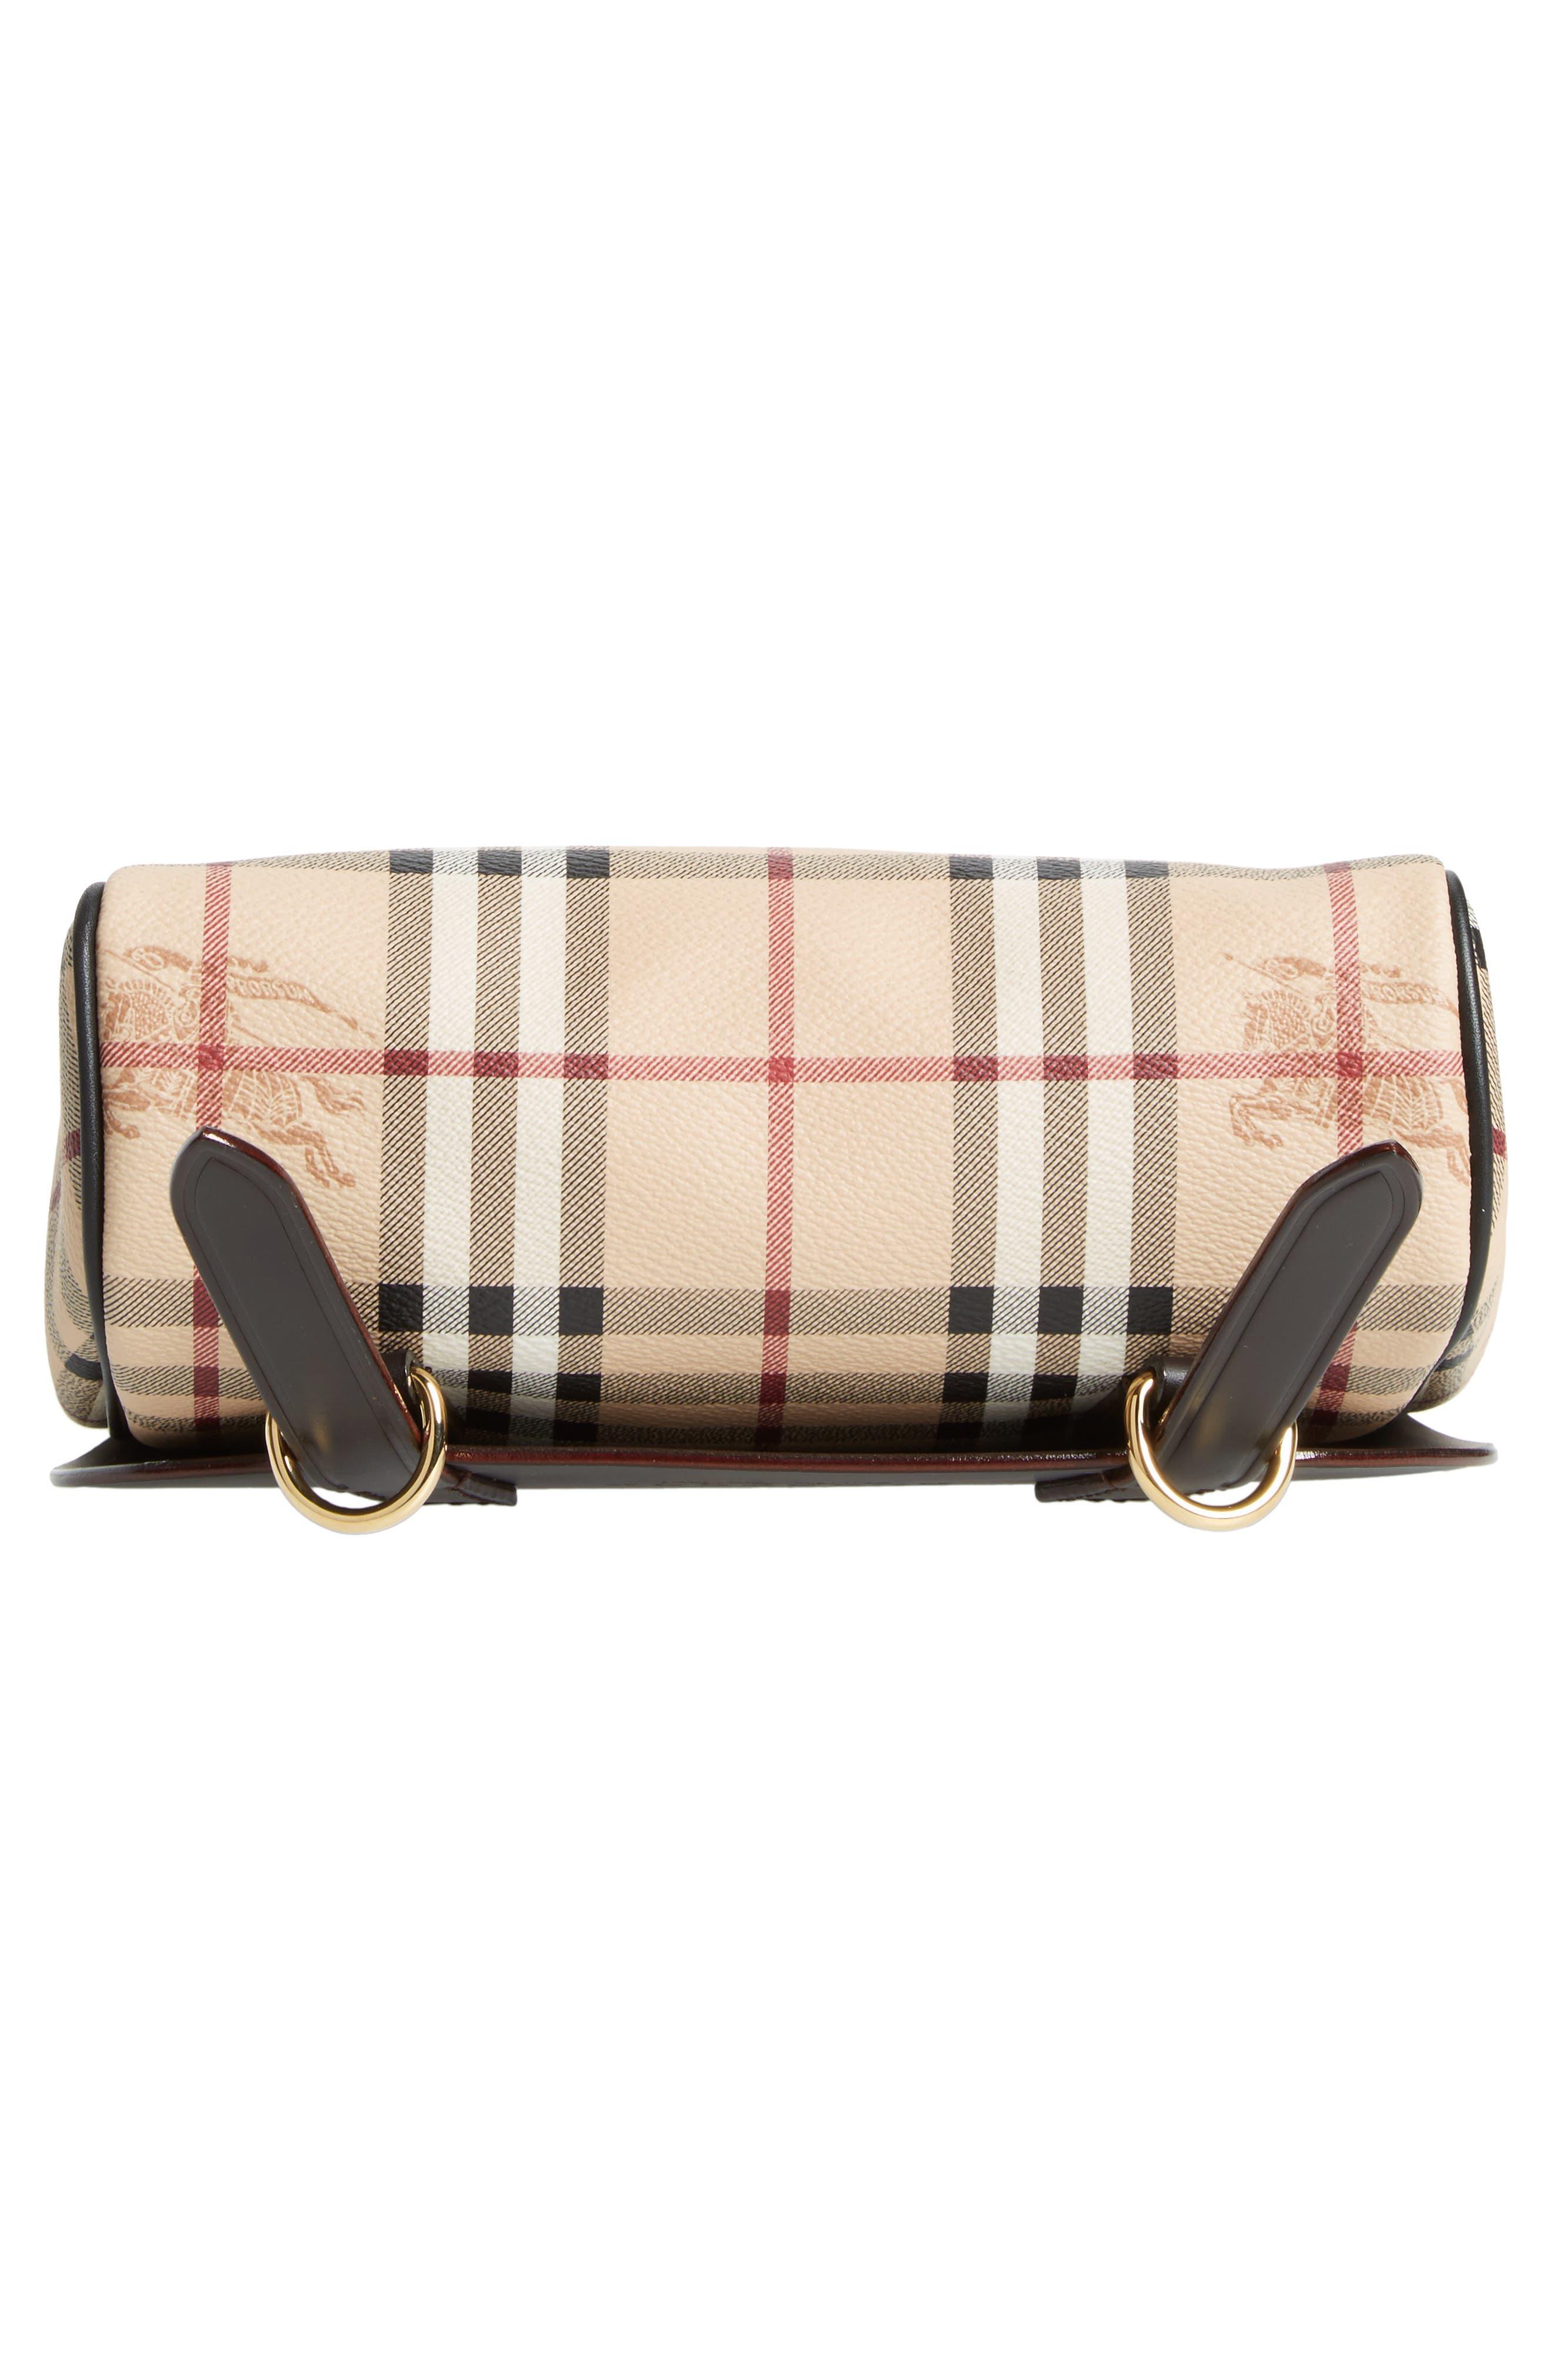 Bridle Leather & Check Shoulder Bag,                             Alternate thumbnail 6, color,                             208